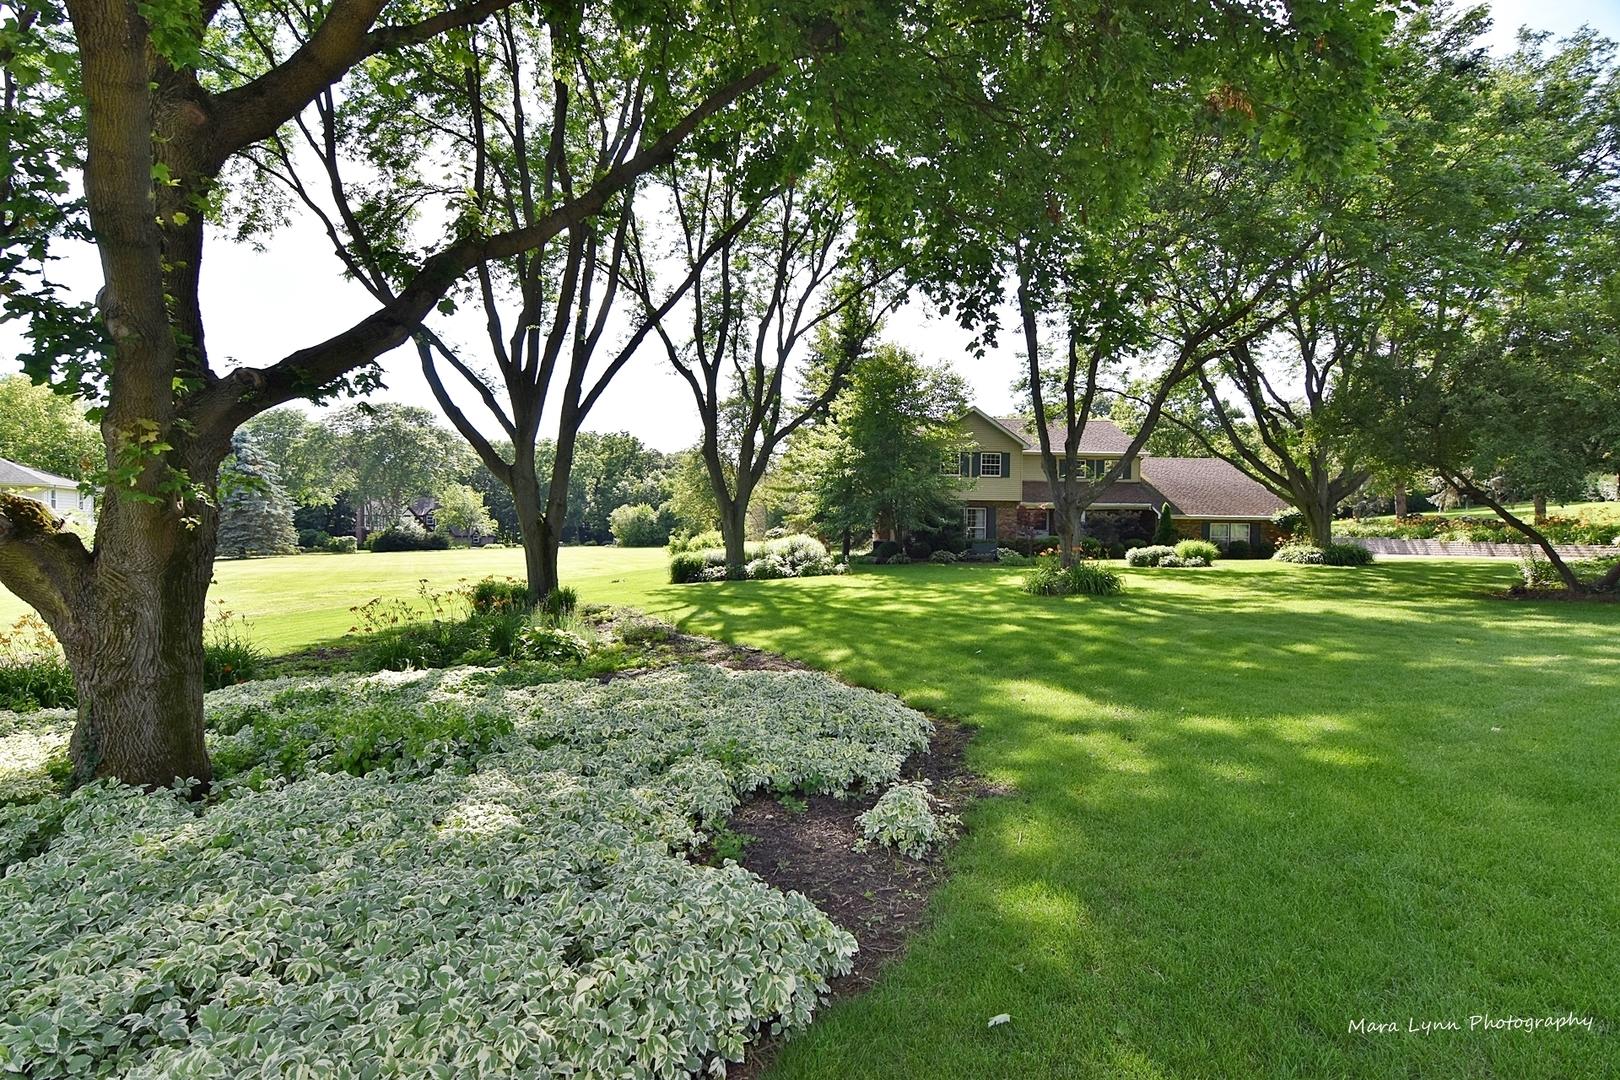 5N120 Meadows, ST. CHARLES, Illinois, 60175